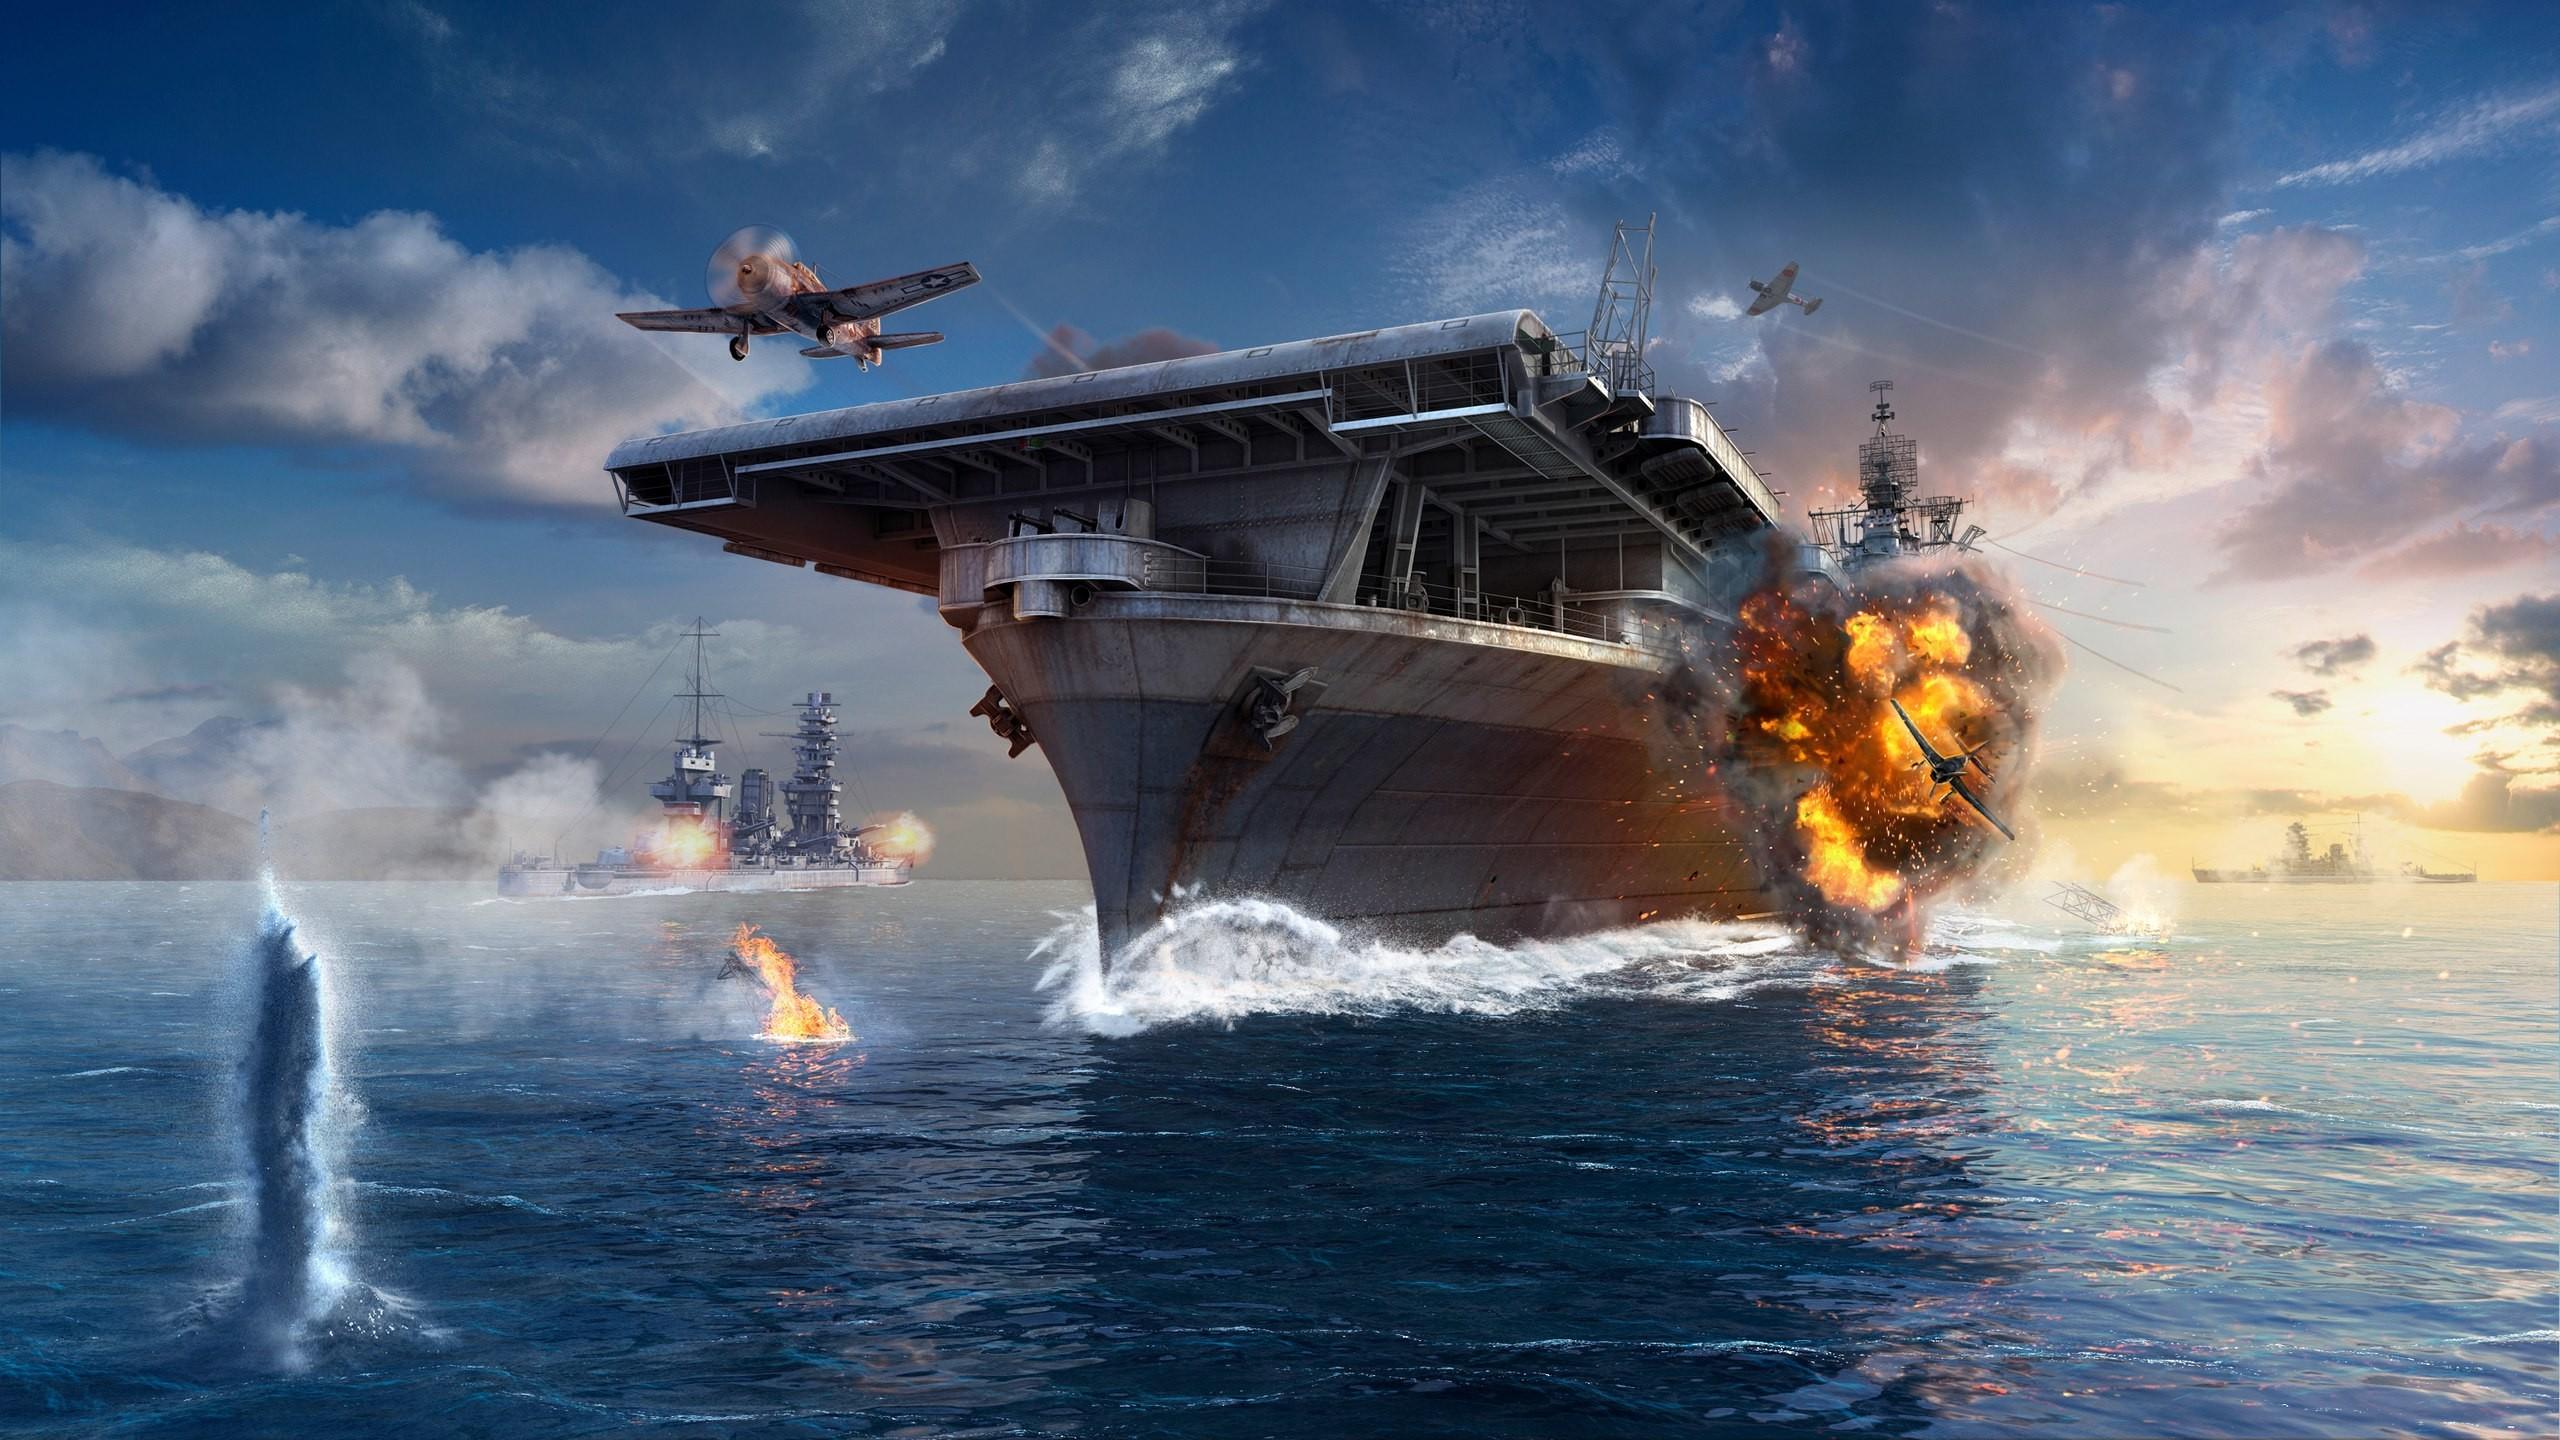 World Of Warships Wallpaper: 2048x1152 World Of Warships 2 2048x1152 Resolution HD 4k